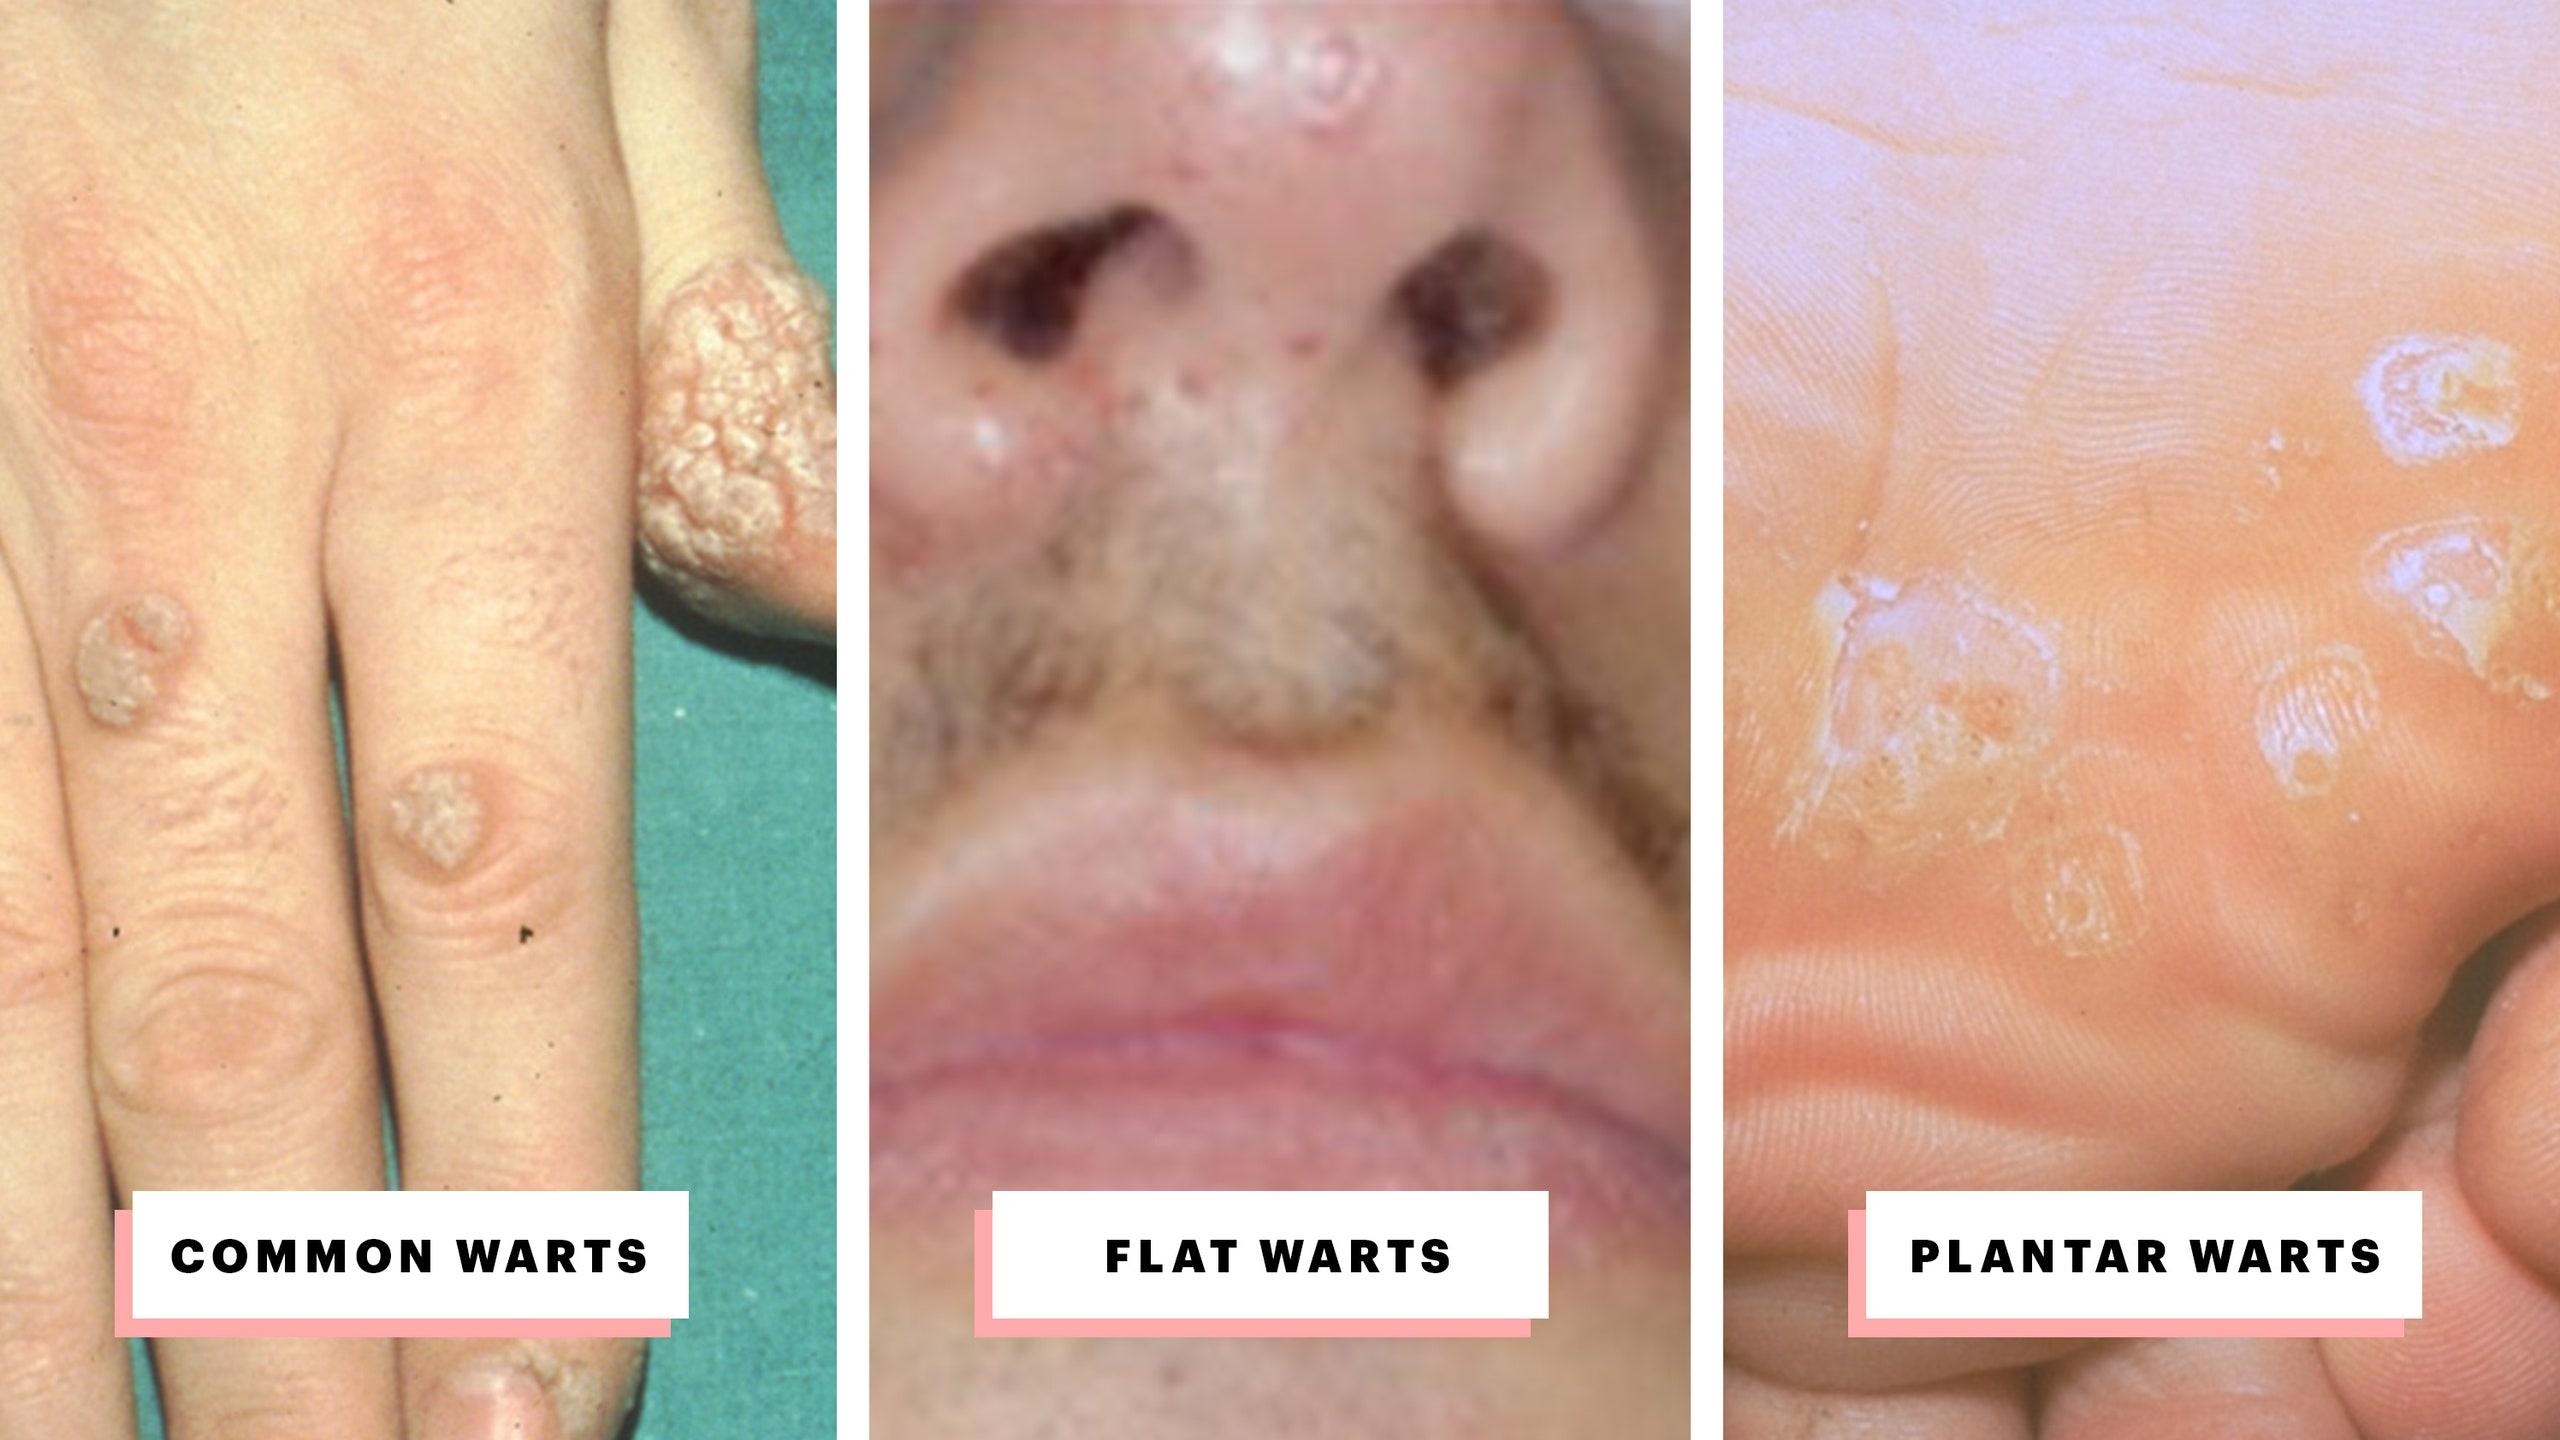 Hpv cure mexican scientist, Human Papilloma Virus | SACCSIV - blog ortodox